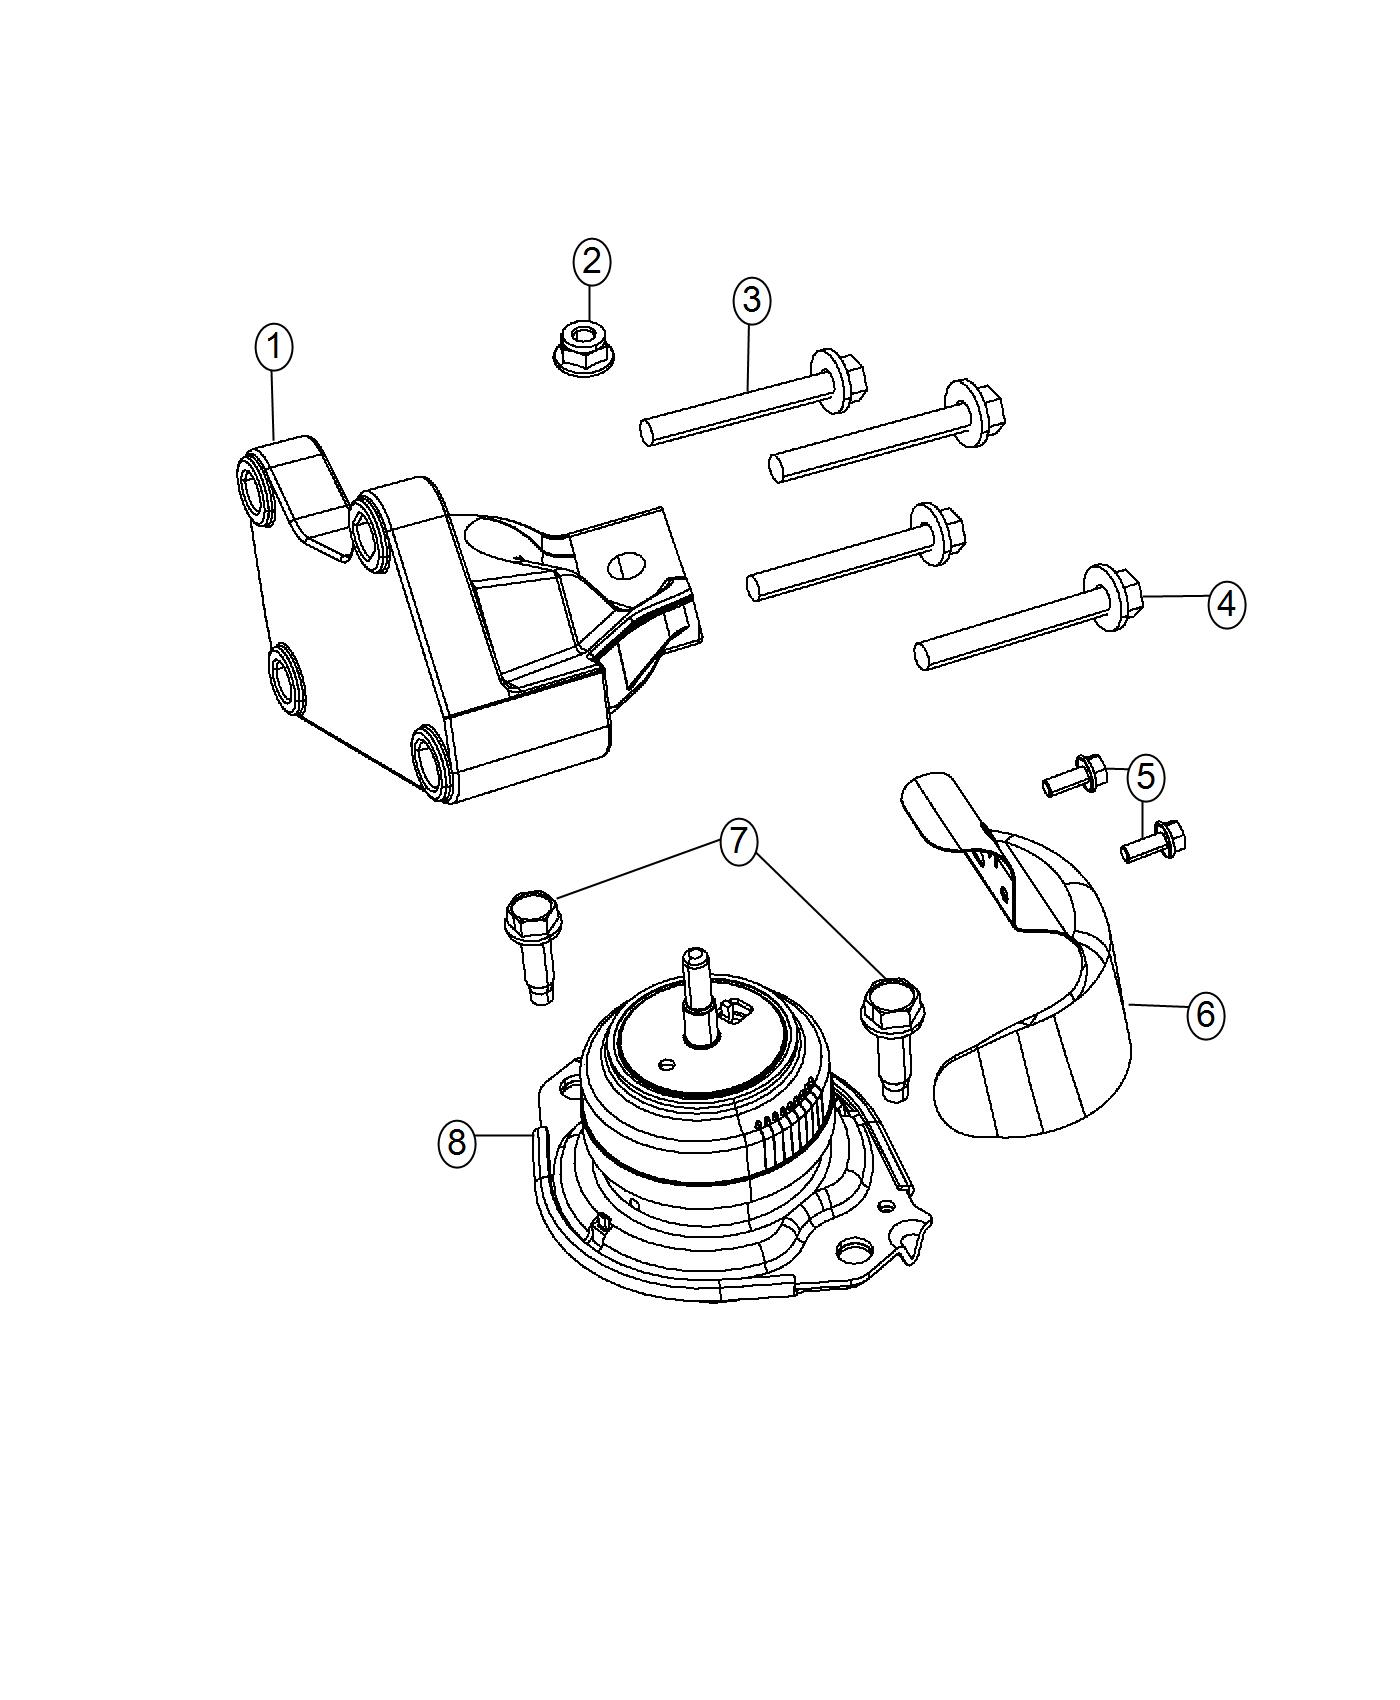 Jeep Grand Cherokee Heat Shield Right Side Engine